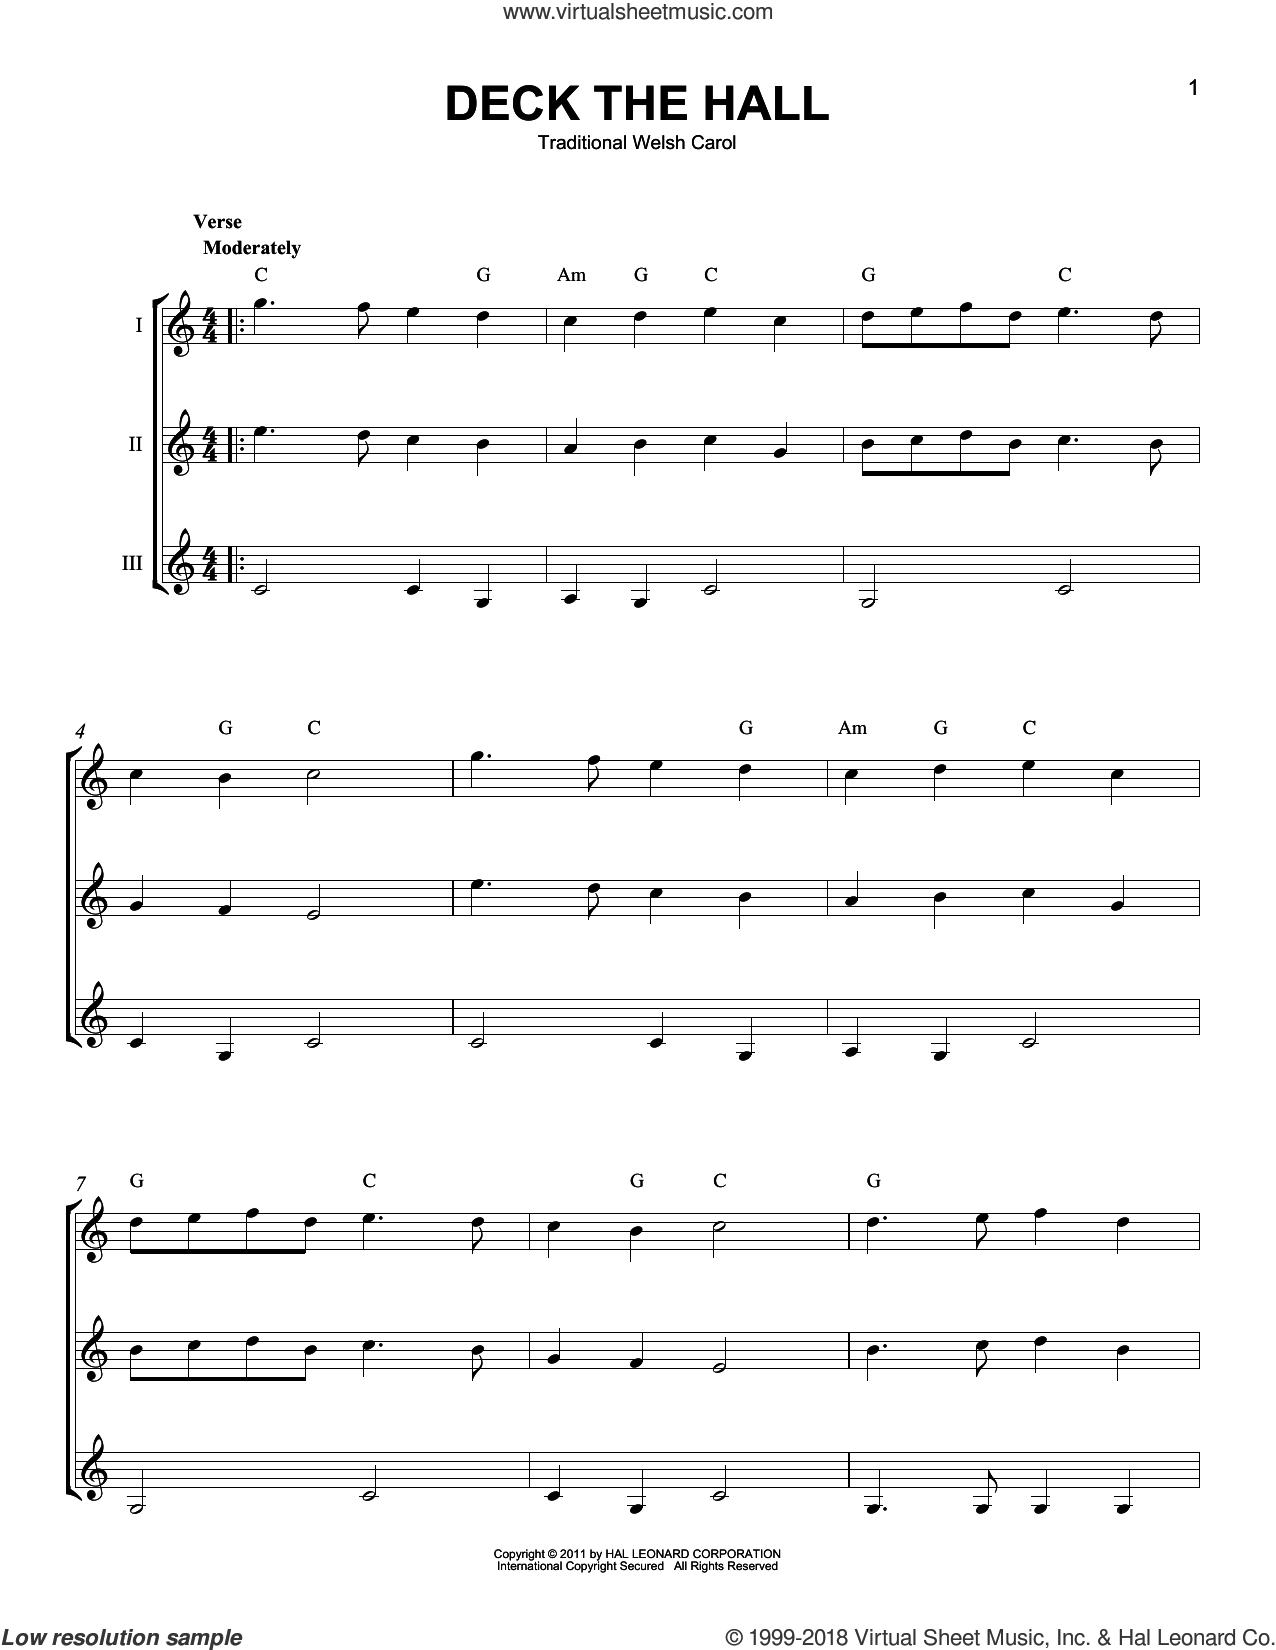 Deck The Hall sheet music for guitar ensemble, intermediate skill level